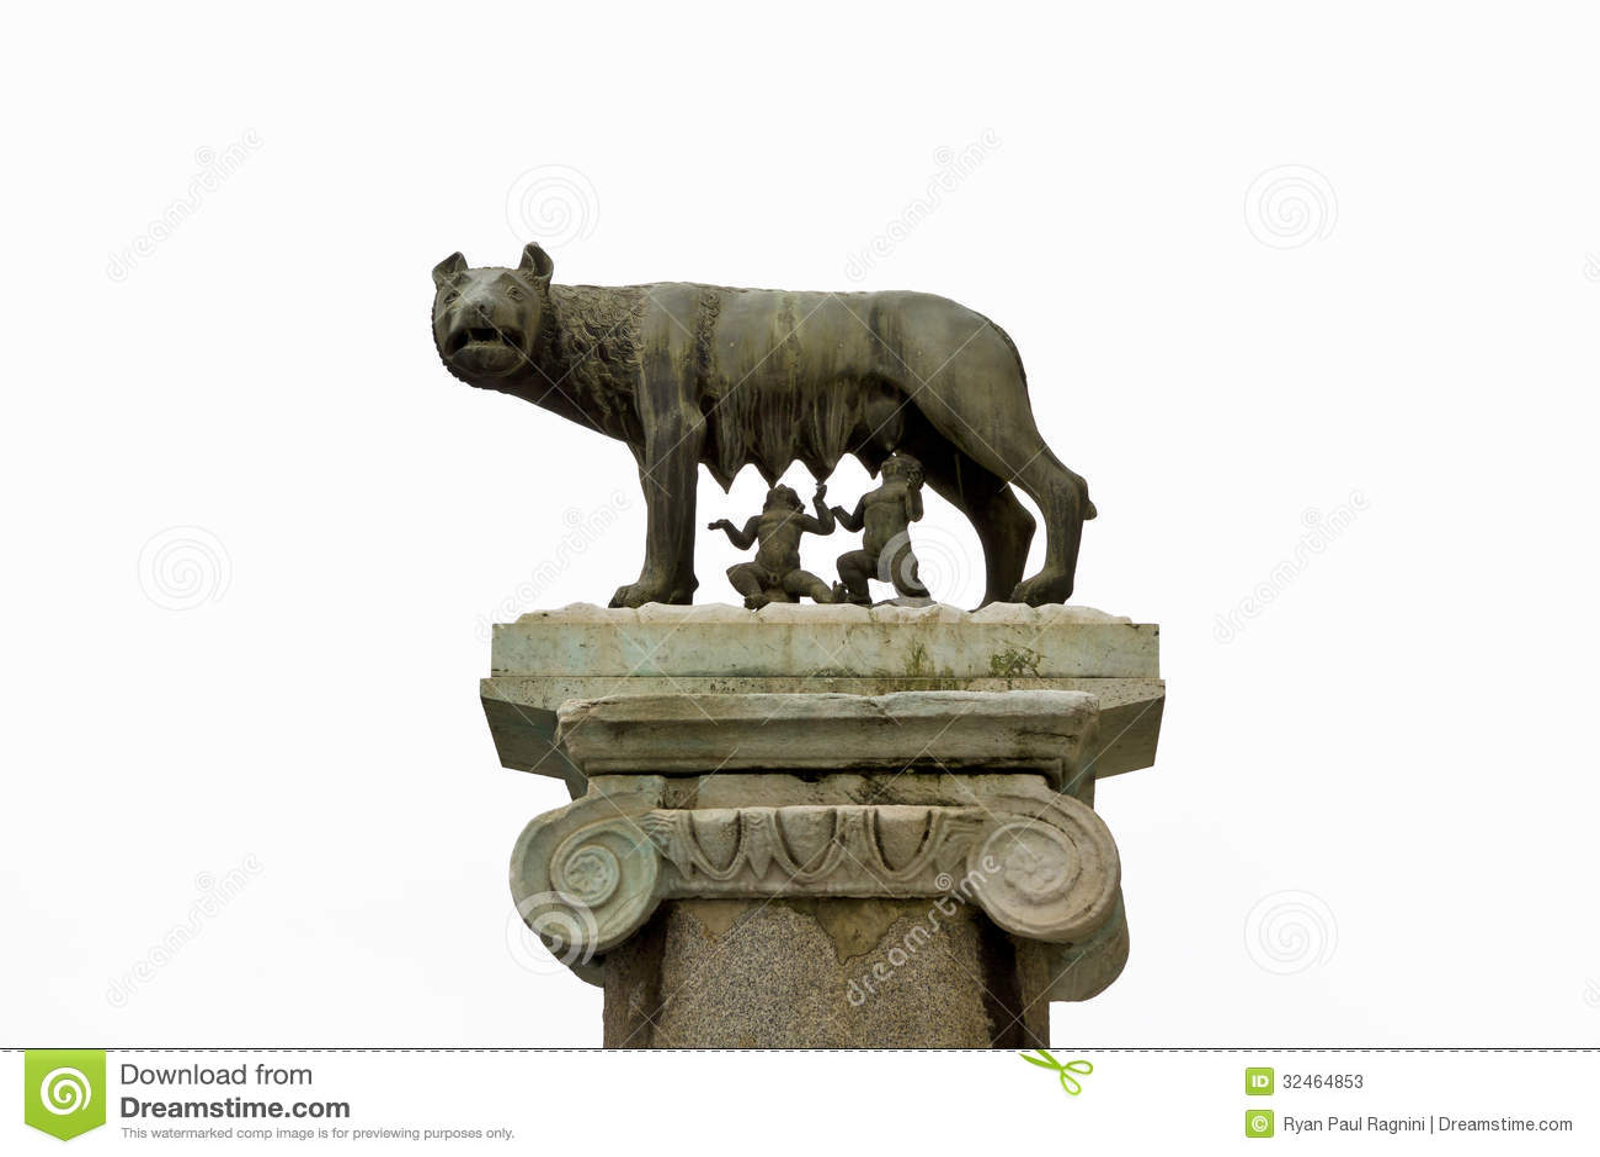 She Wolf Romulus Remus Statue